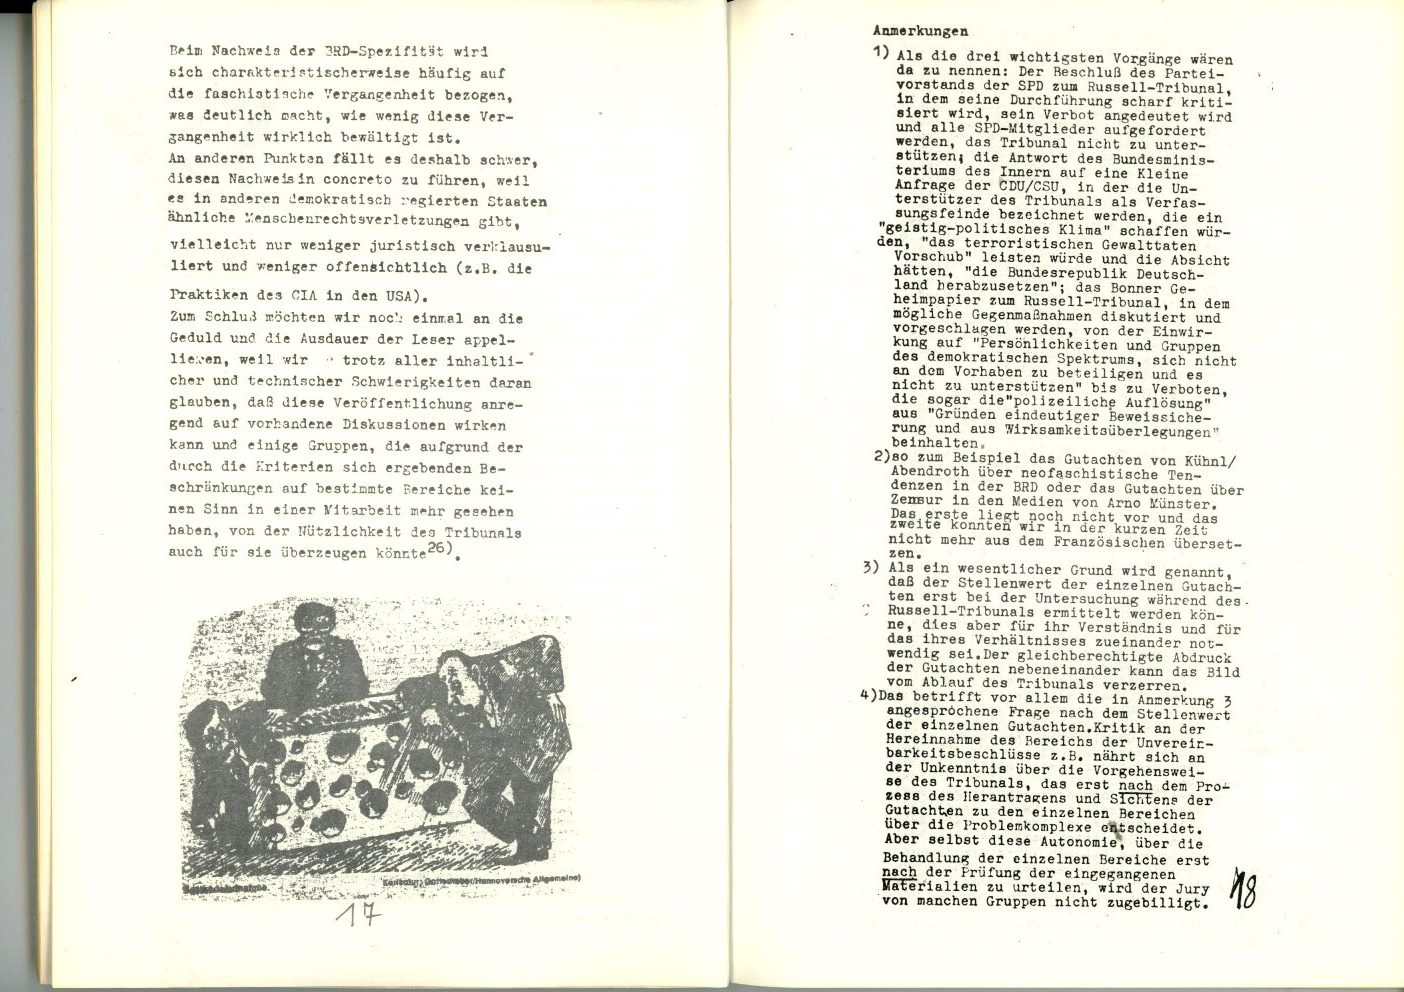 Marburg_Russell_Initiative_1978_10